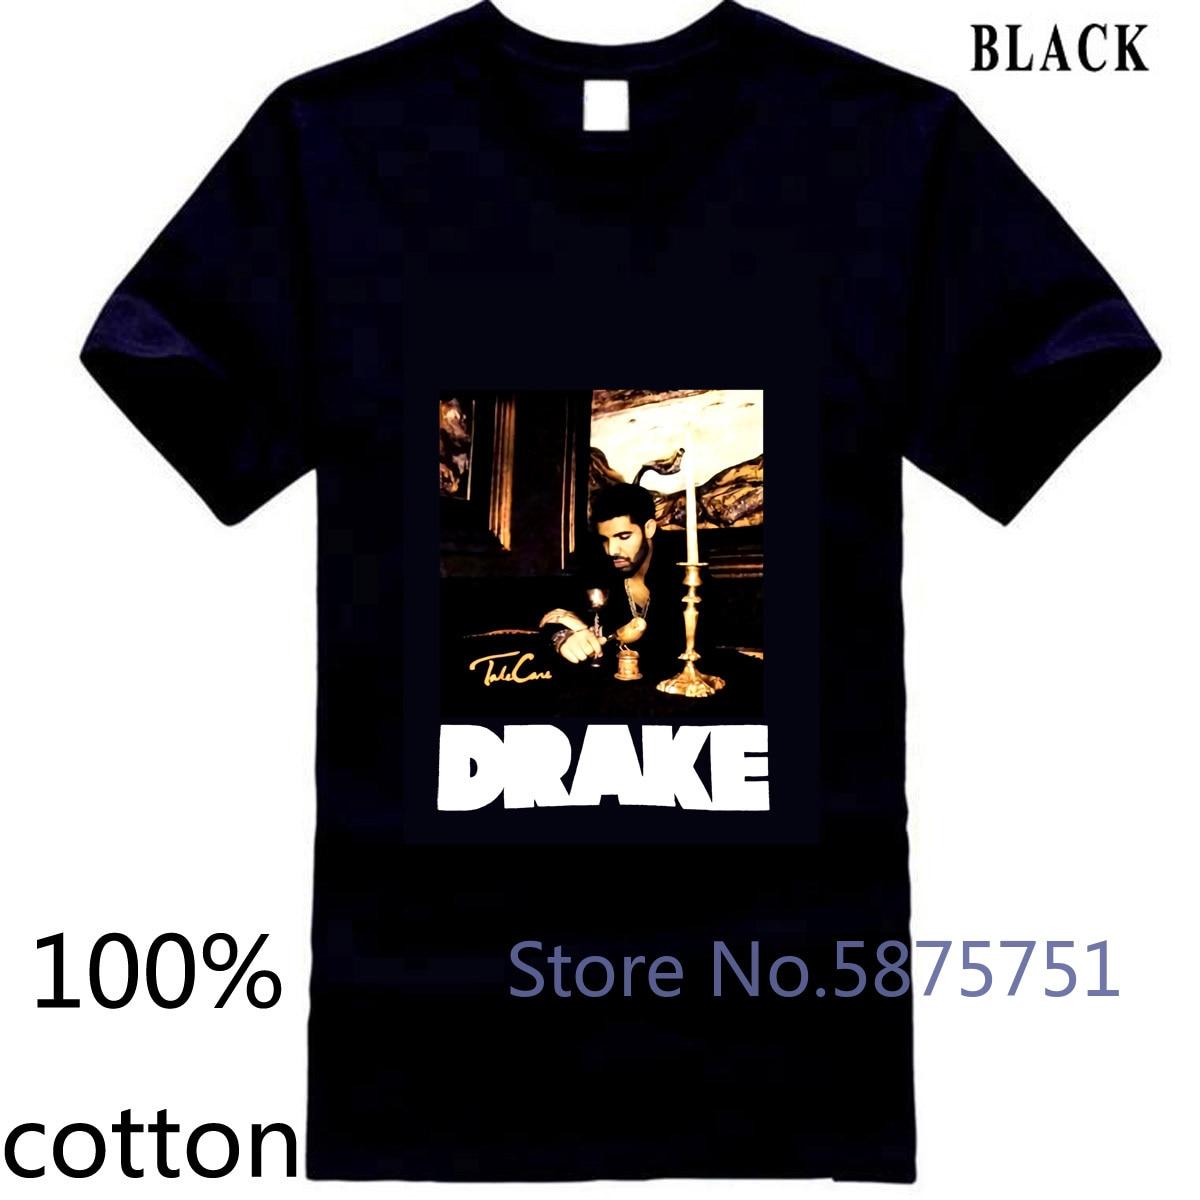 Drake Candles gris Logo reflectante negro Nuevo estilo oficial adulto Hip Hop hombres Venta de camiseta de los hombres camiseta tops camisetas de algodón